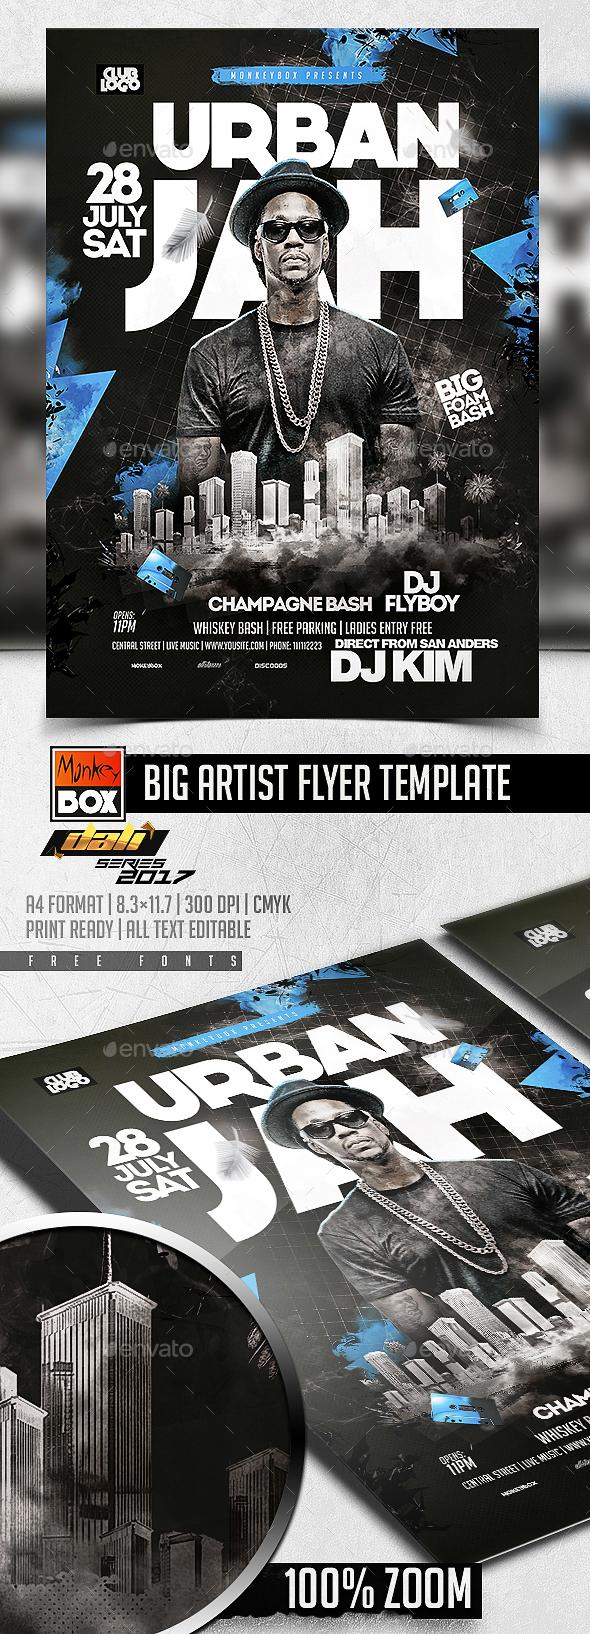 Big Artist Flyer Template - Flyers Print Templates